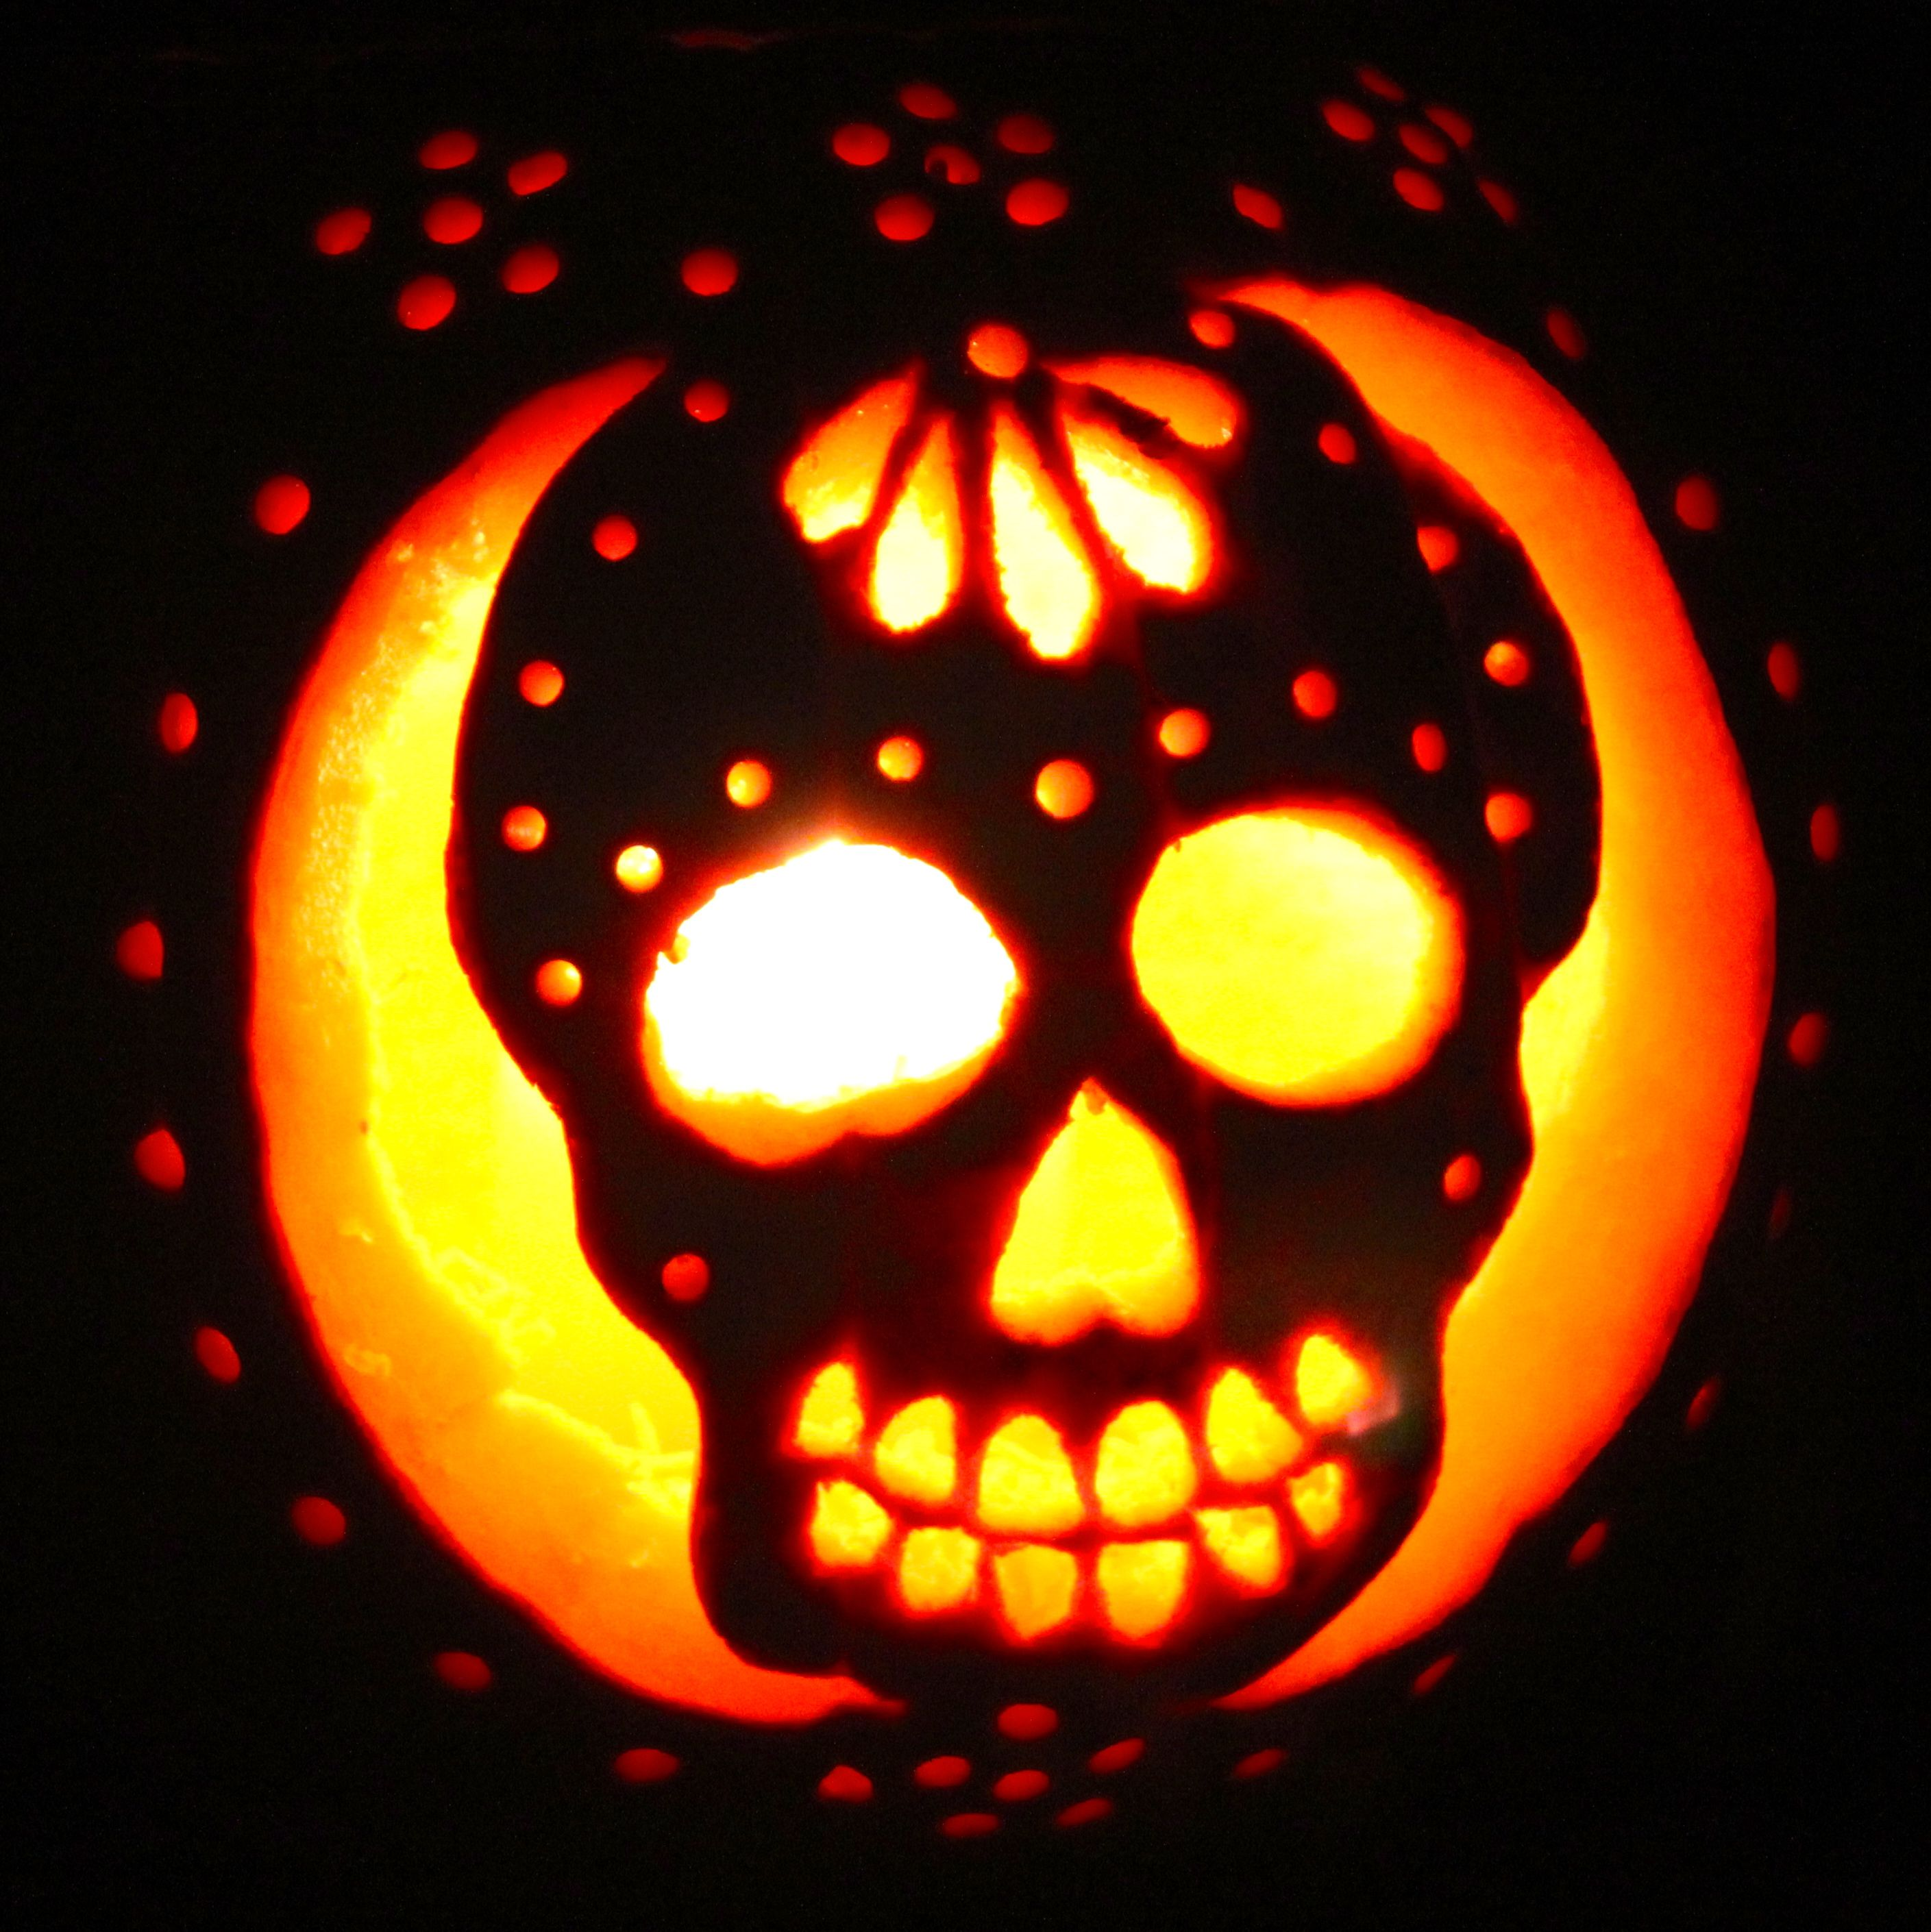 Sugar skull pumpkin carving patterns for Skeleton pumpkin pattern